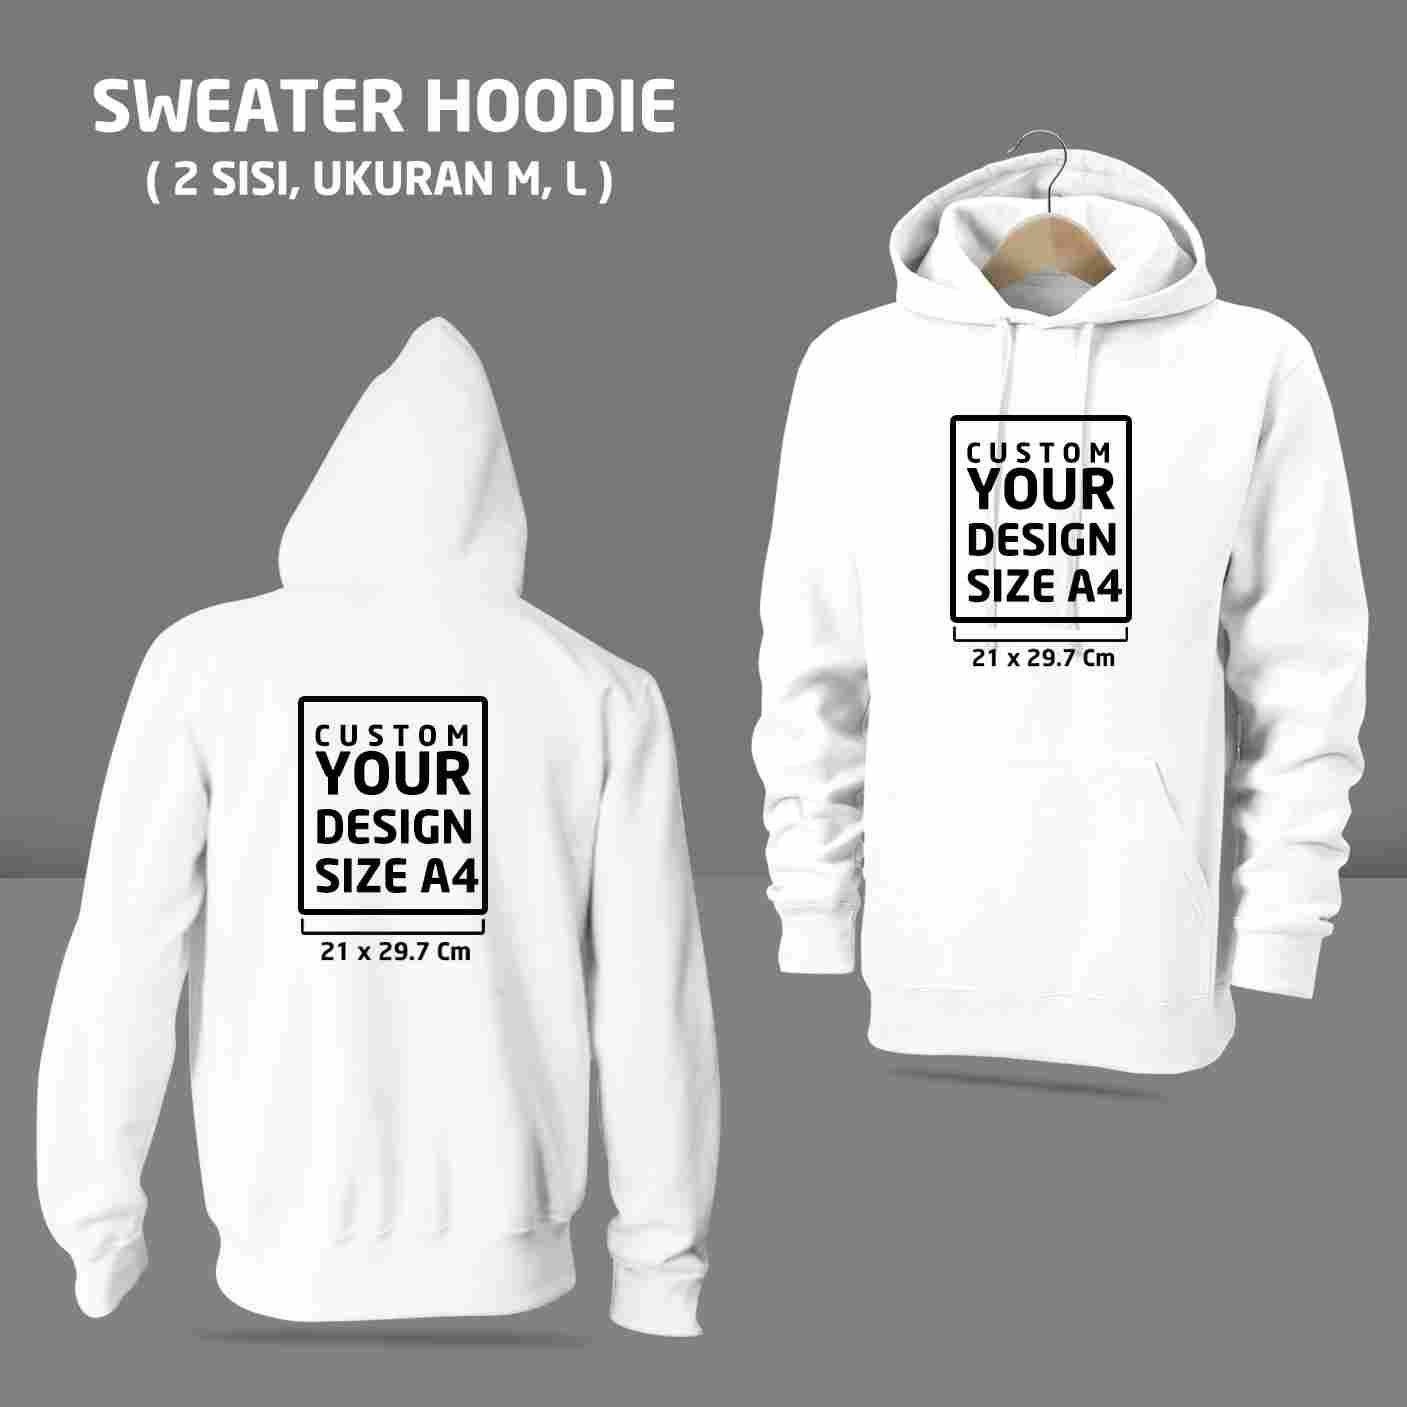 Sweater Hoodie Custom 2 Sisi (M, L)